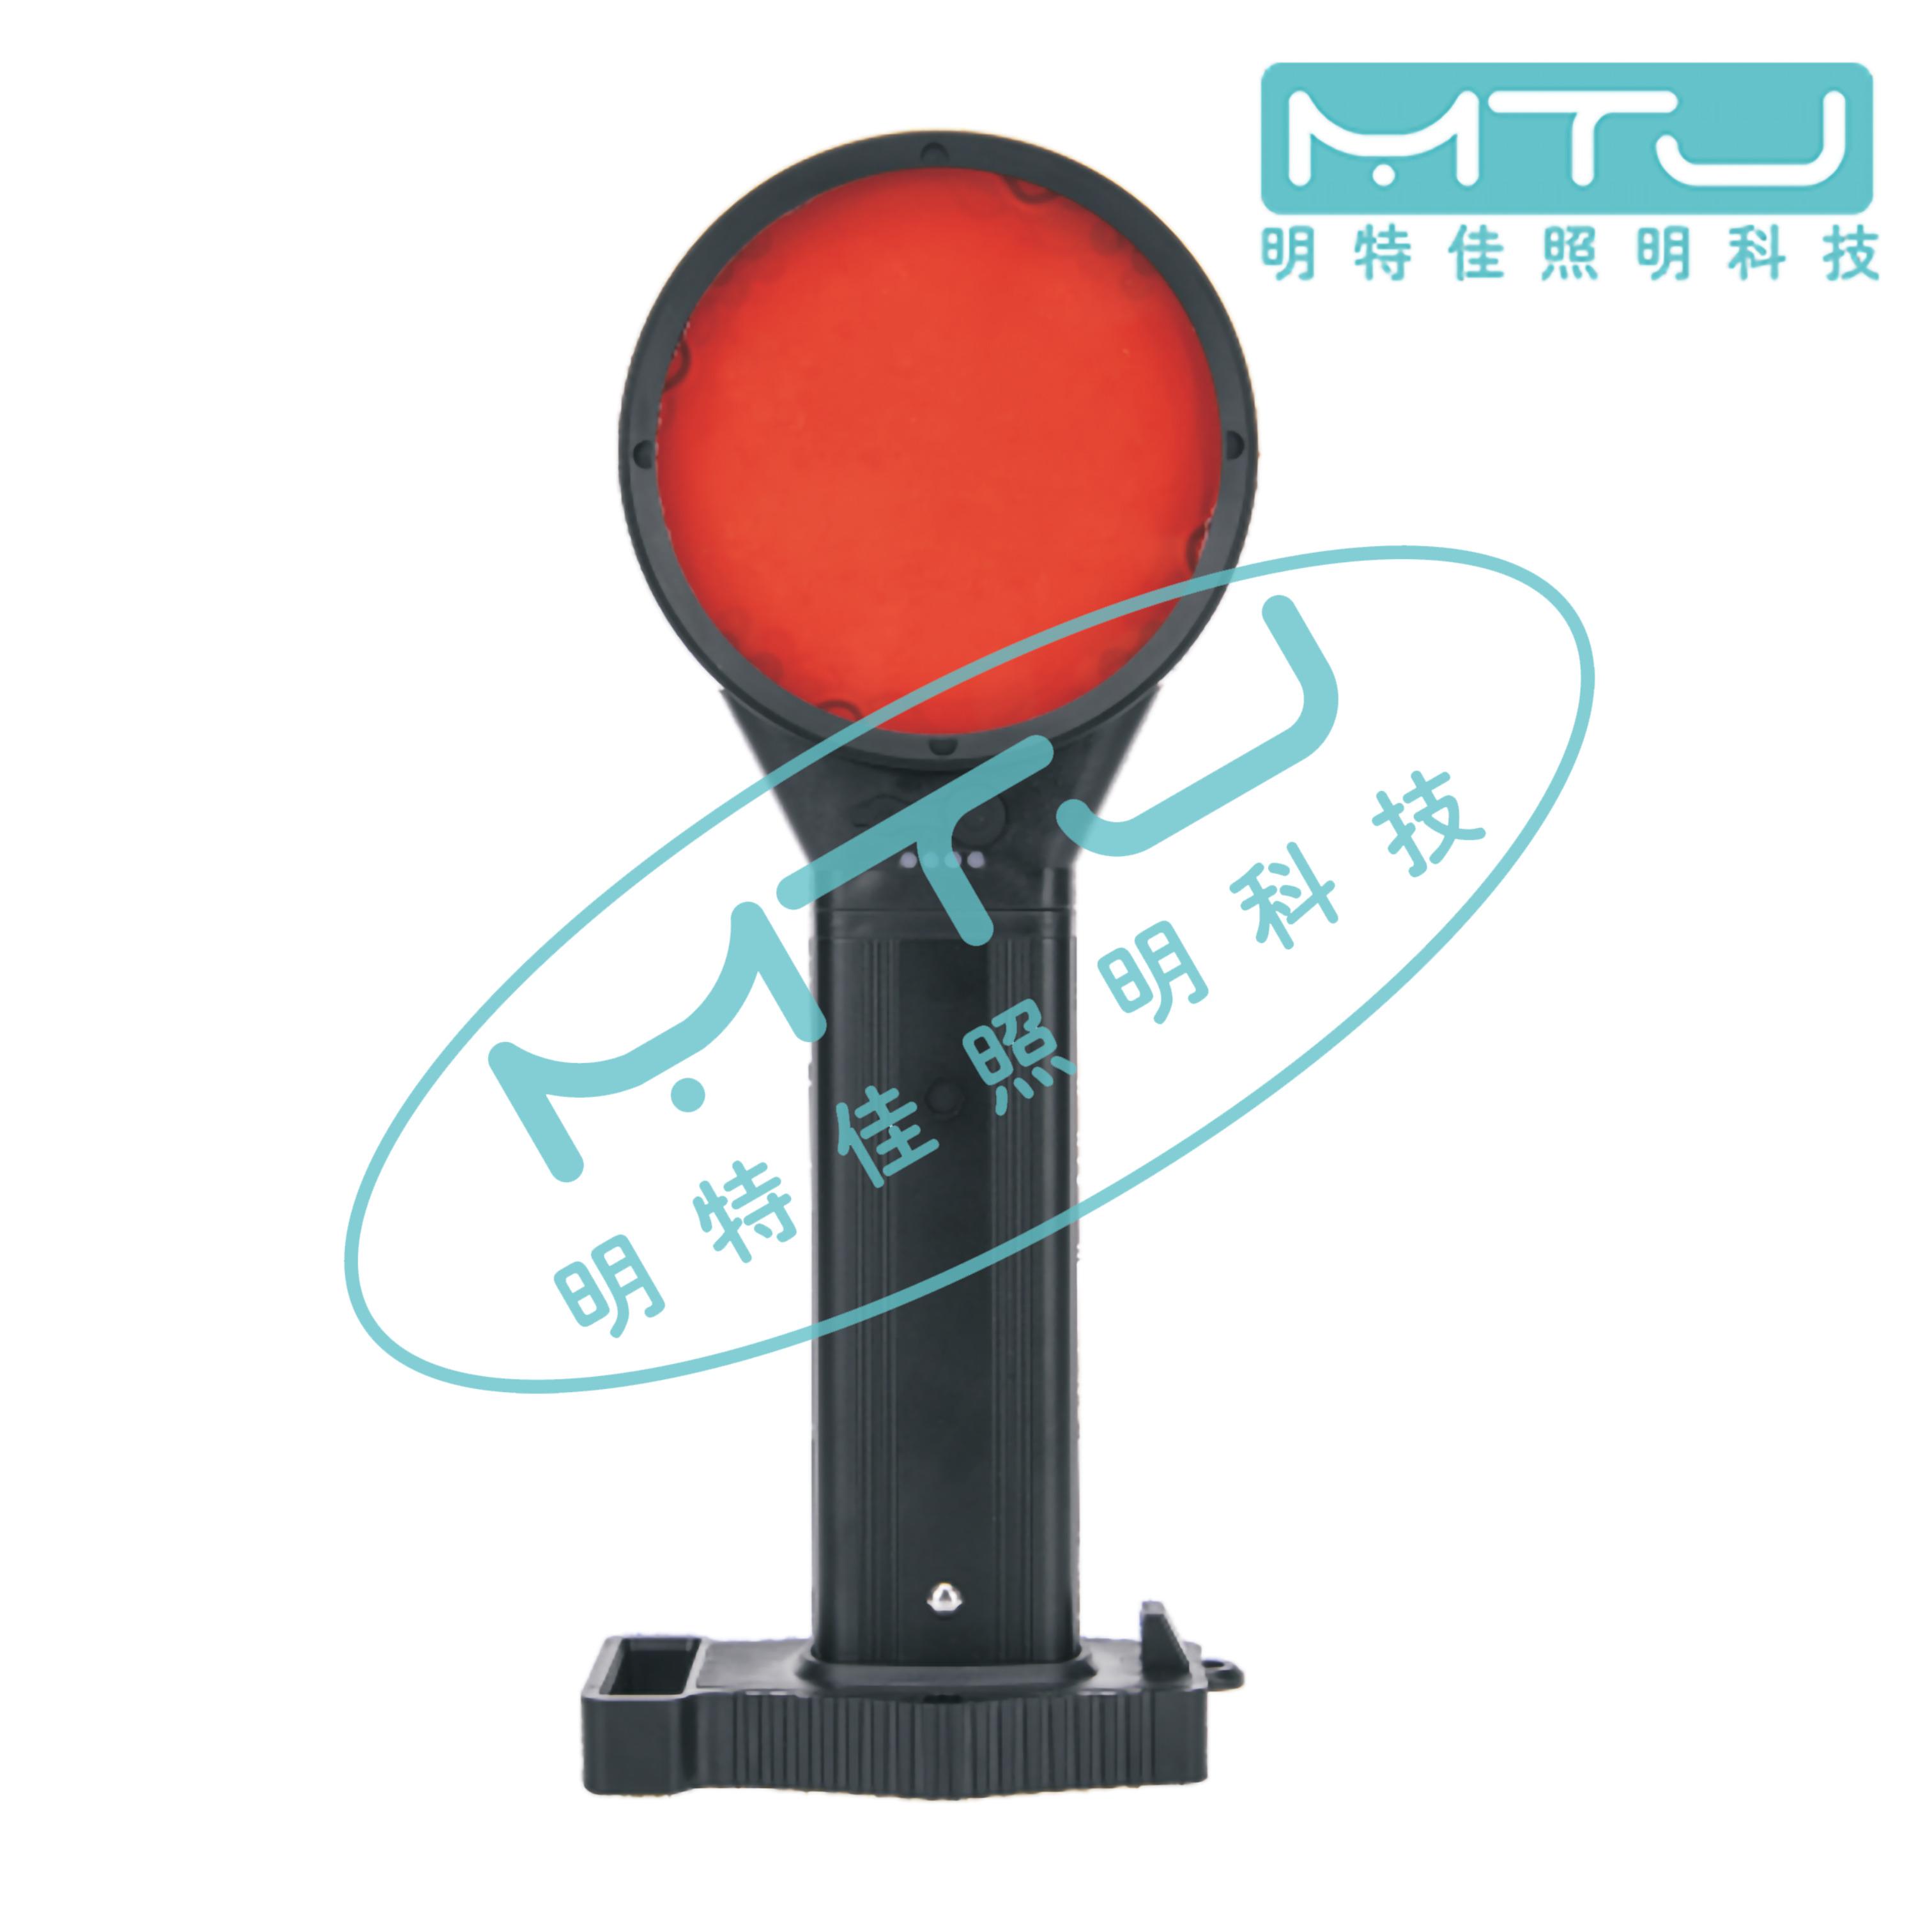 BXD4100C 远程方位灯